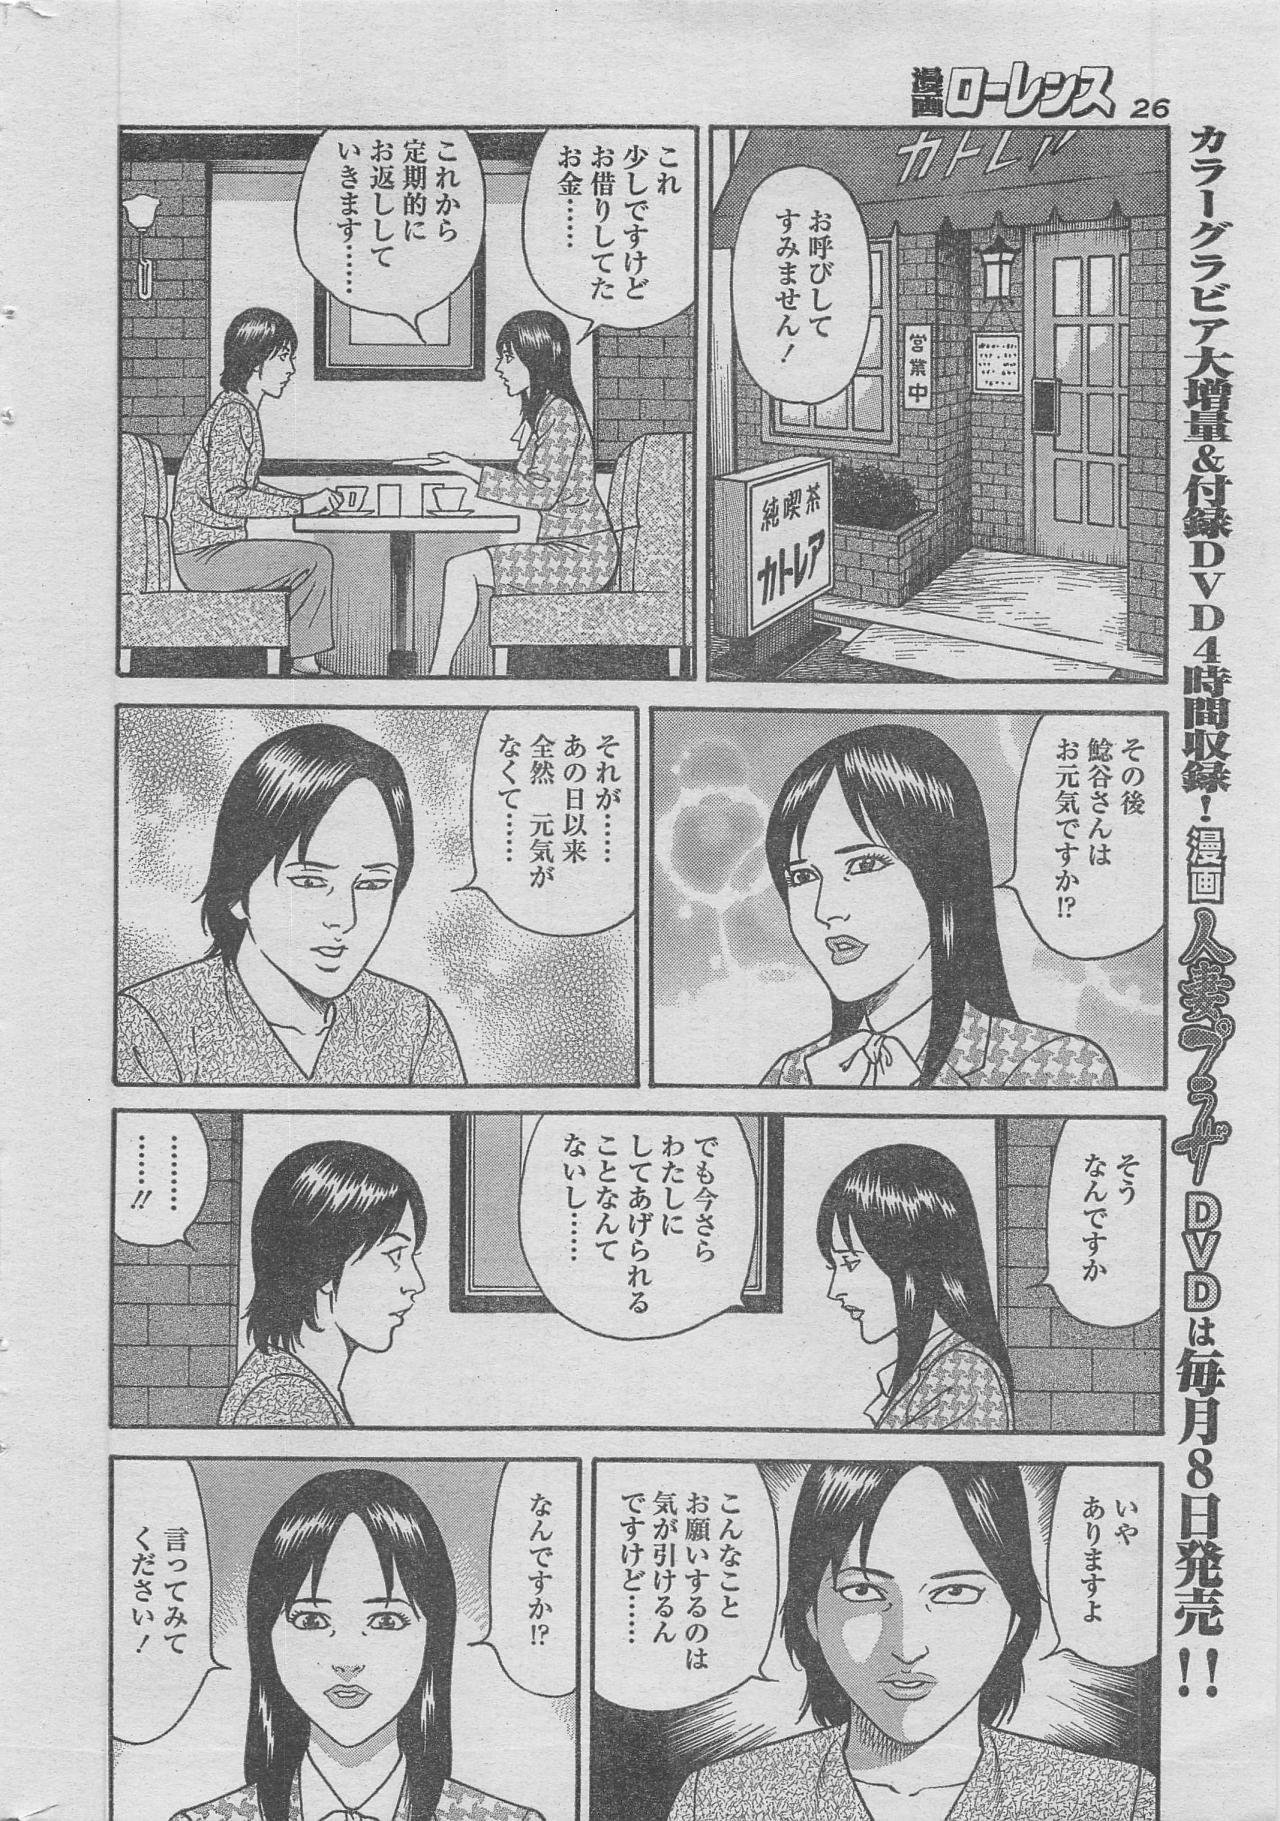 Manga Lawrence 2013-04 13